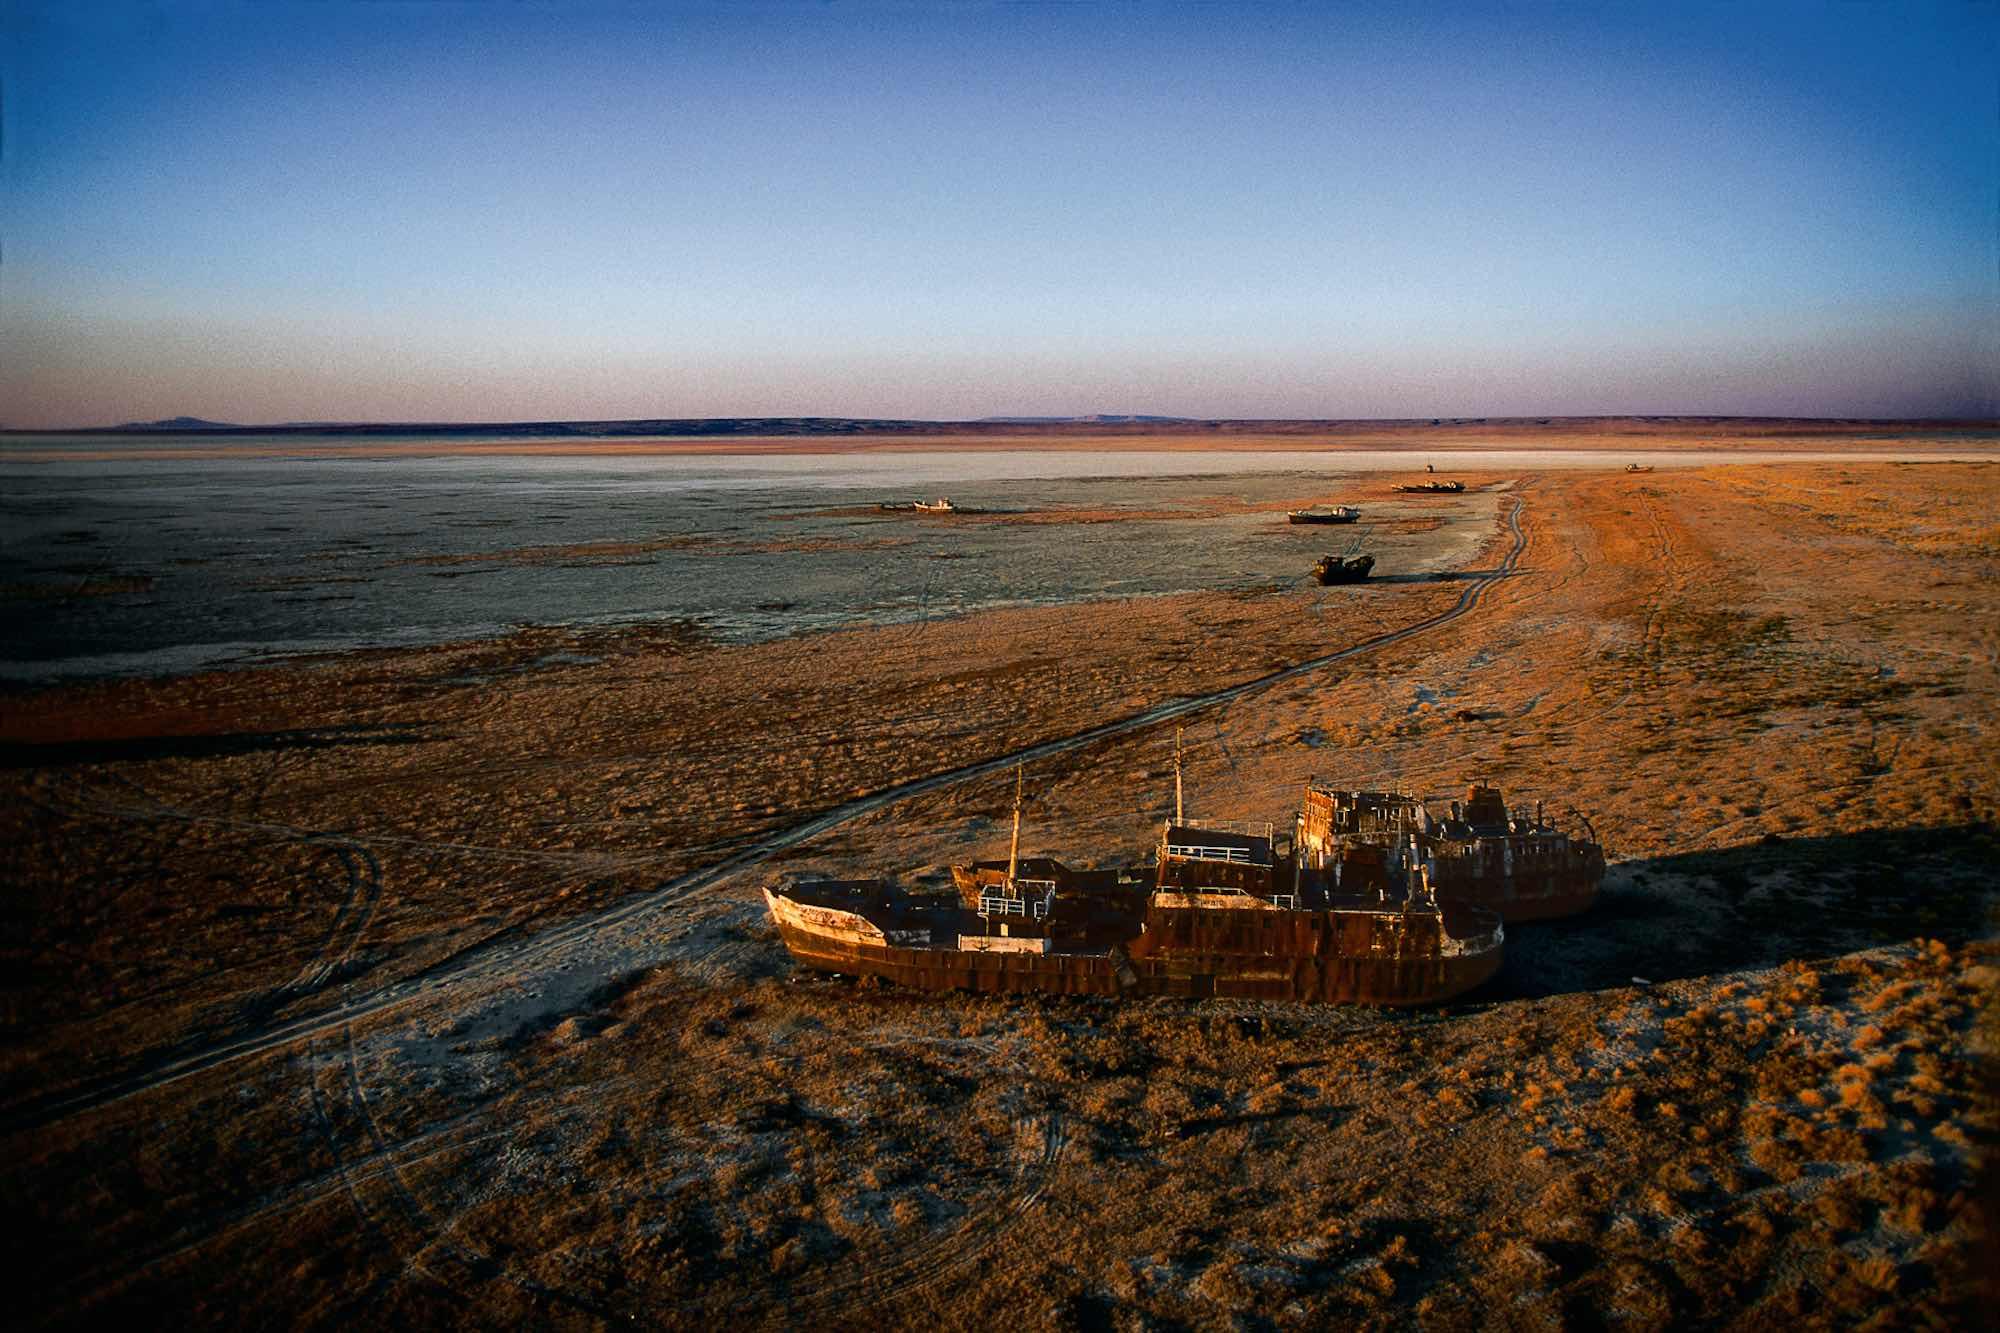 Stranded boat - Yann Arthus-Bertrand